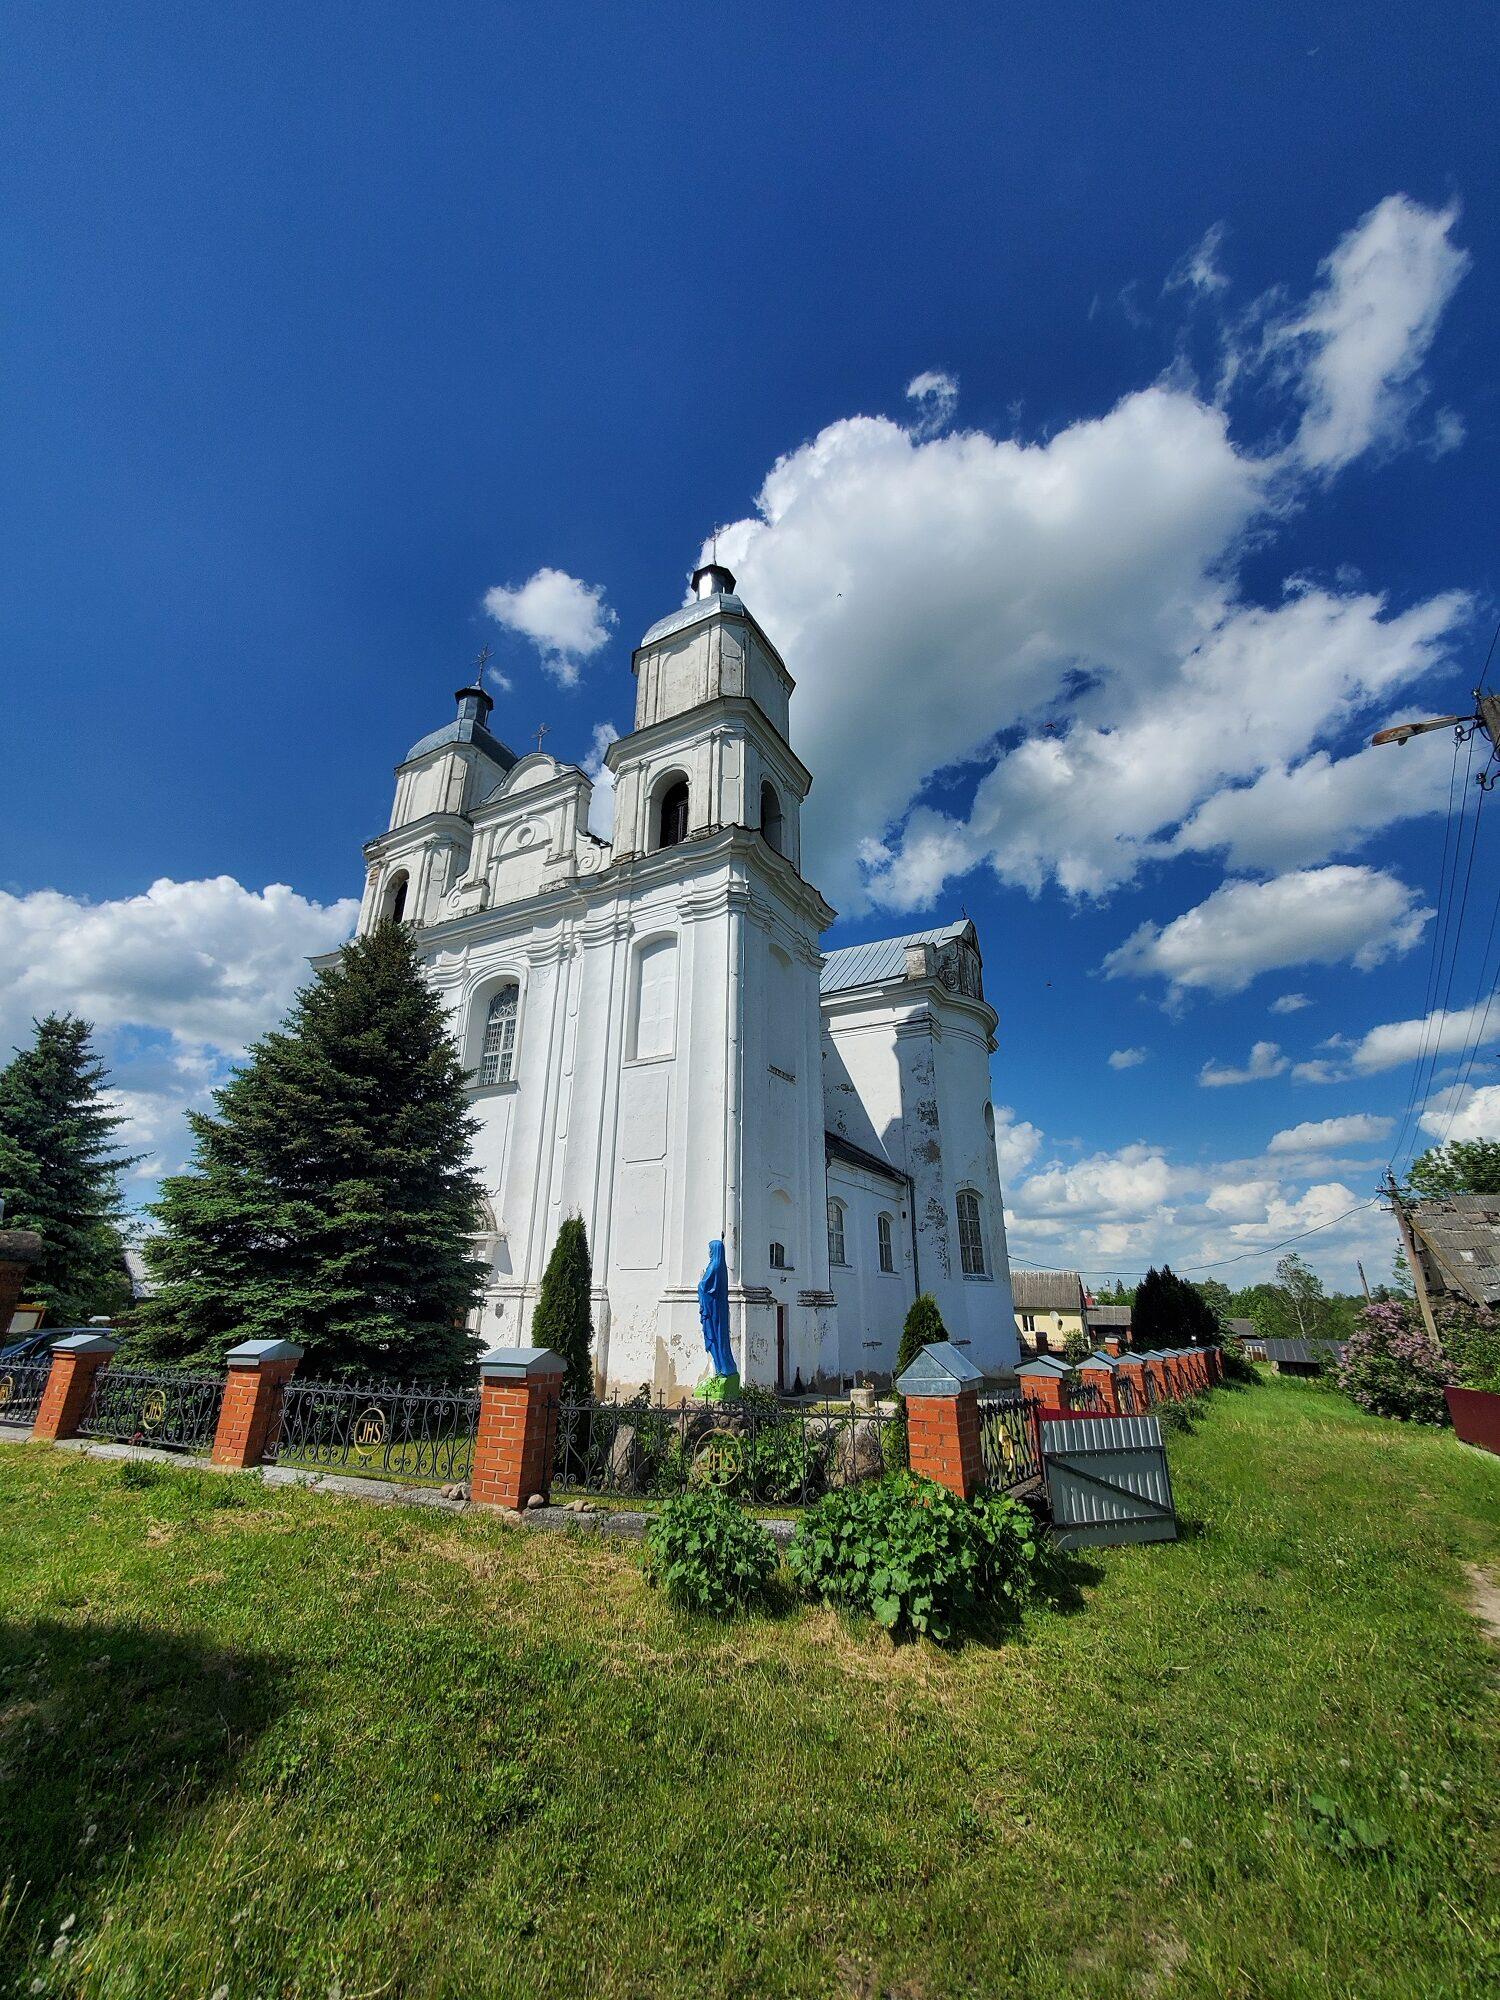 20200606 151351 rotated - Костел Святой Троицы в деревне Дуниловичи